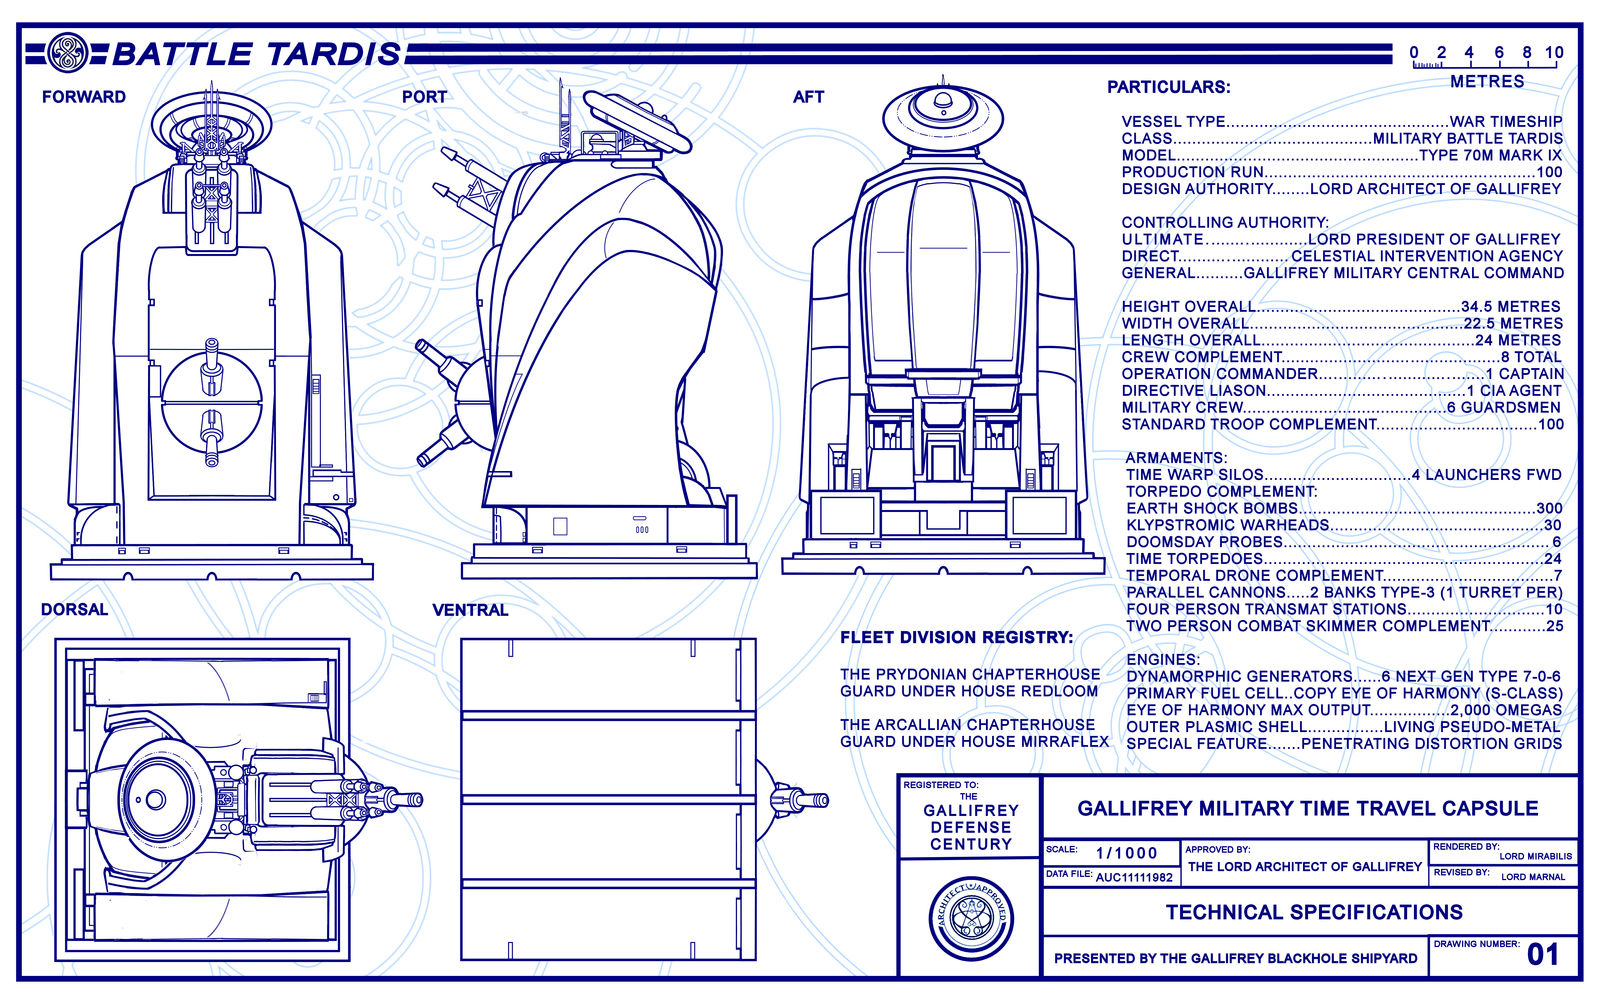 Battle TARDIS Schematics Page 1 (REVISED) by Time-Lord ... on tardis detailed plans, tardis girl, tardis diagram, tardis interior, tardis blueprints, tardis library, tardis rooms, tardis controls, tardis dimensions and plans, tardis building plans, tardis bedroom, tardis roundels, tardis space, tardis floor plan, tardis blue, tardis decal, tardis siege mode, tardis types, tardis models,